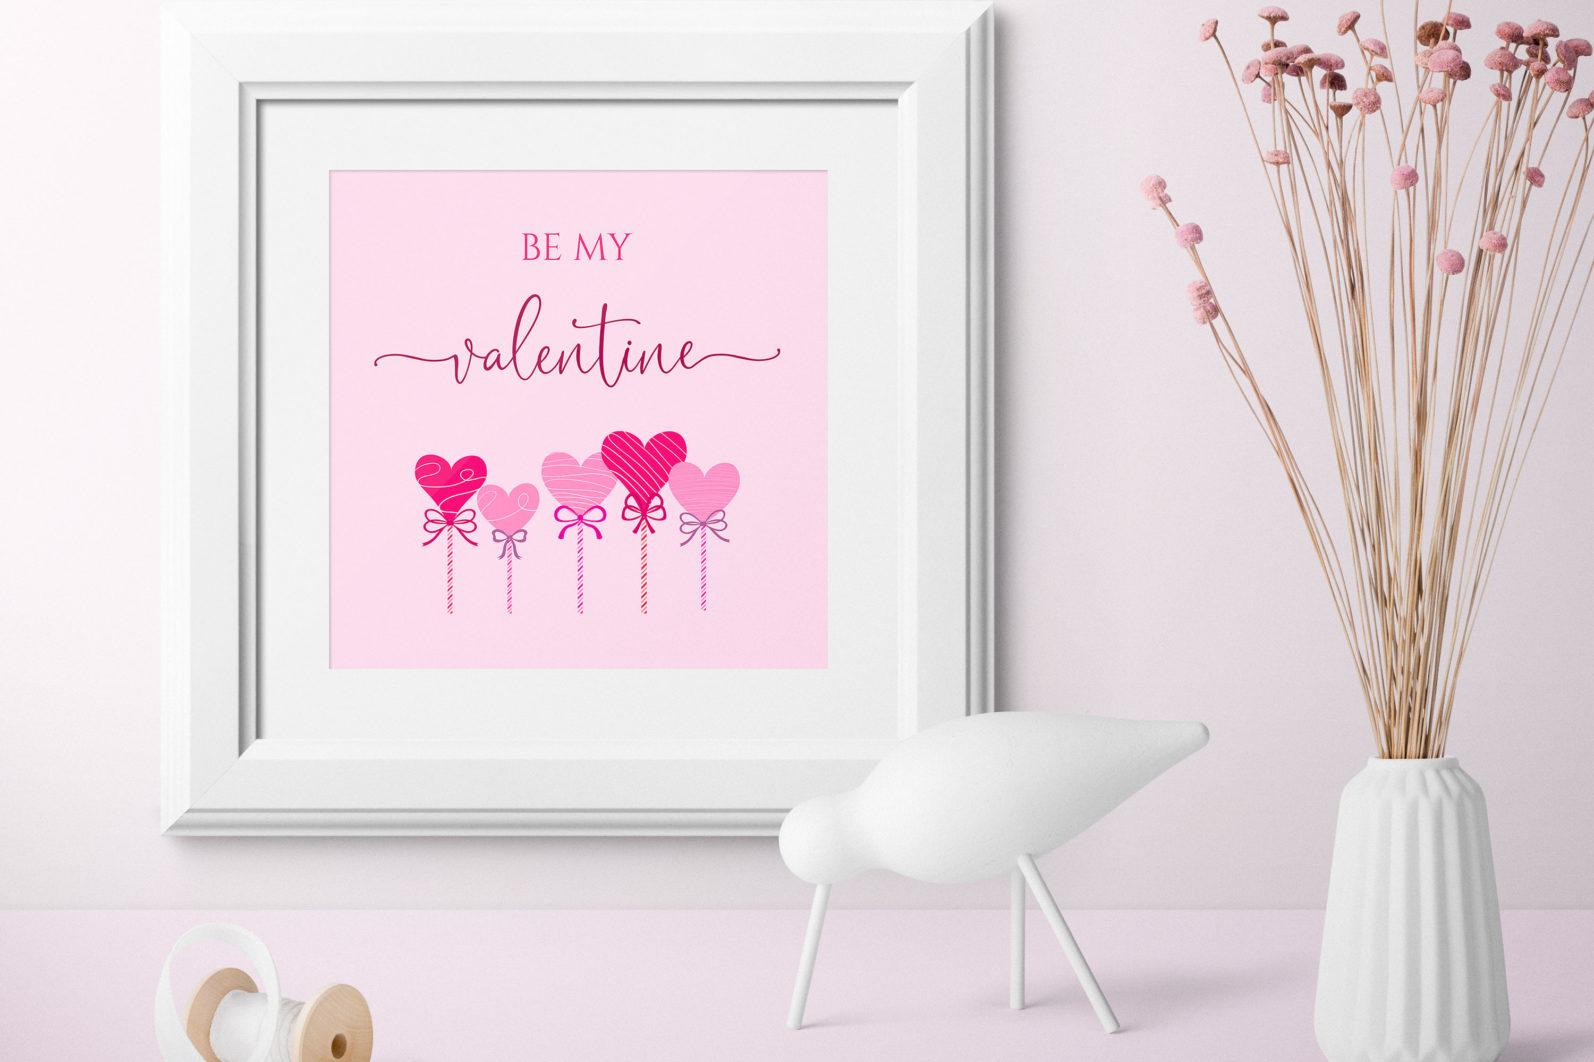 """Be Me Valentine"" Printable - be my valentine 1 scaled -"